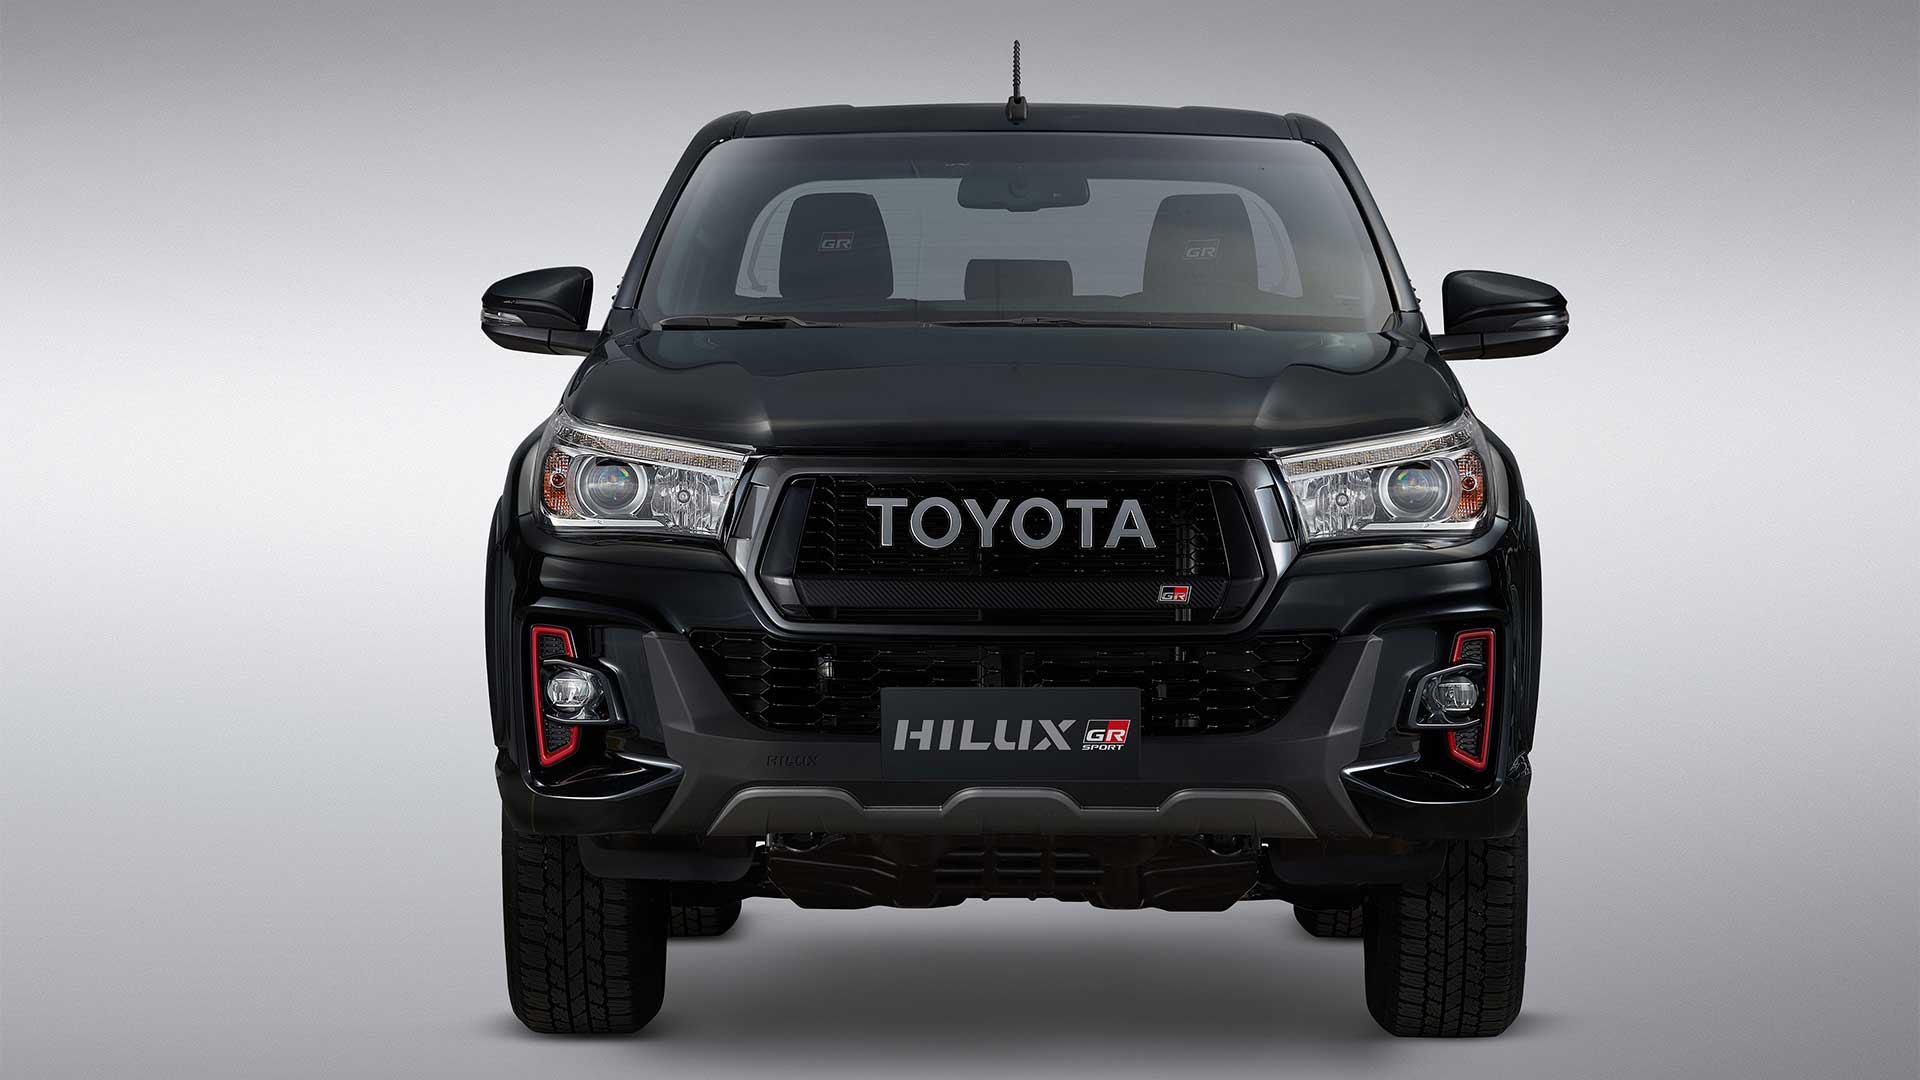 Toyota Hilux GR-Sport II V6